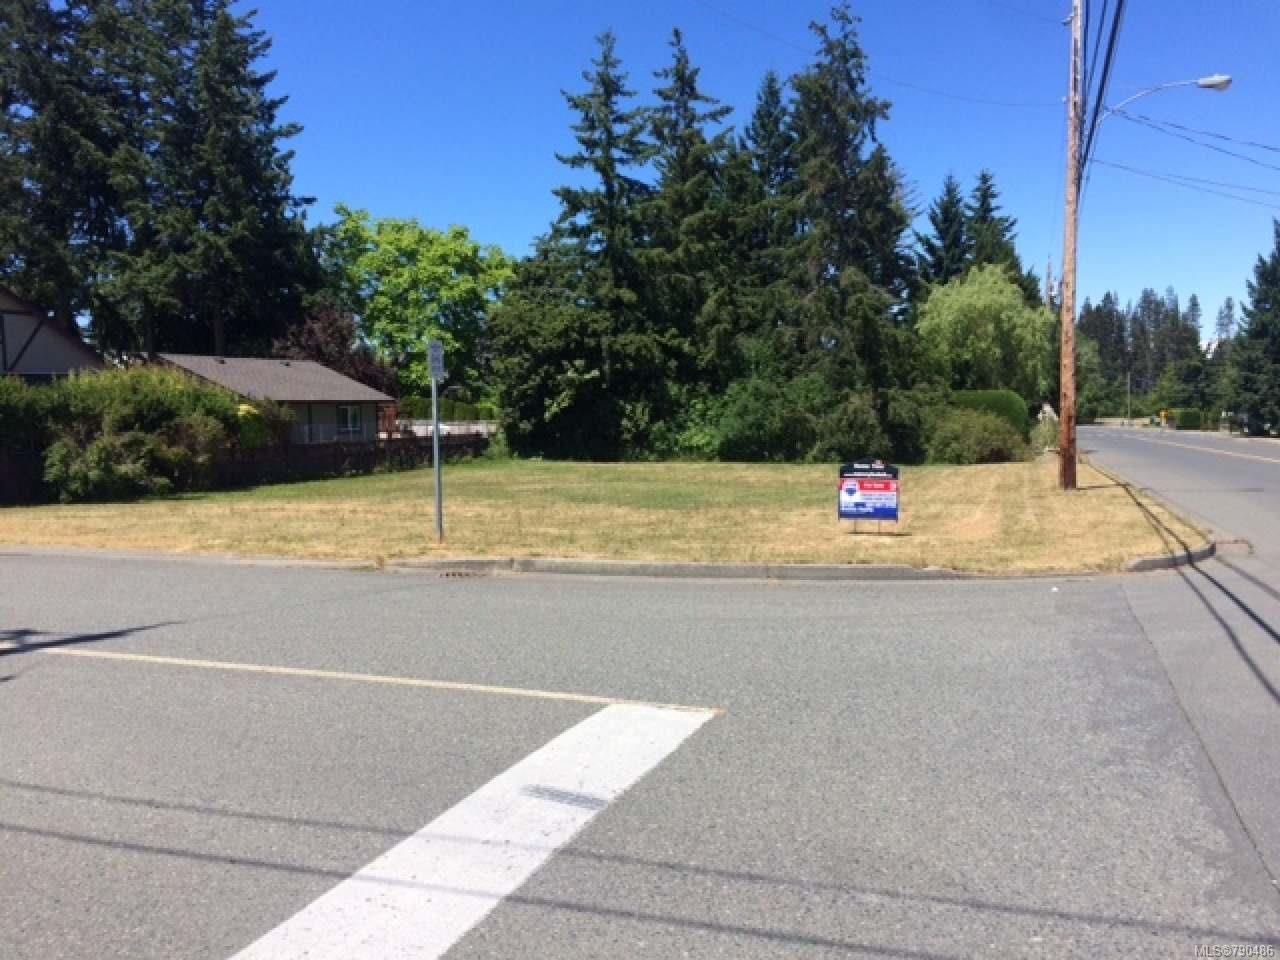 Main Photo: 491 N PYM N STREET in PARKSVILLE: PQ Parksville Land for sale (Parksville/Qualicum)  : MLS®# 790486